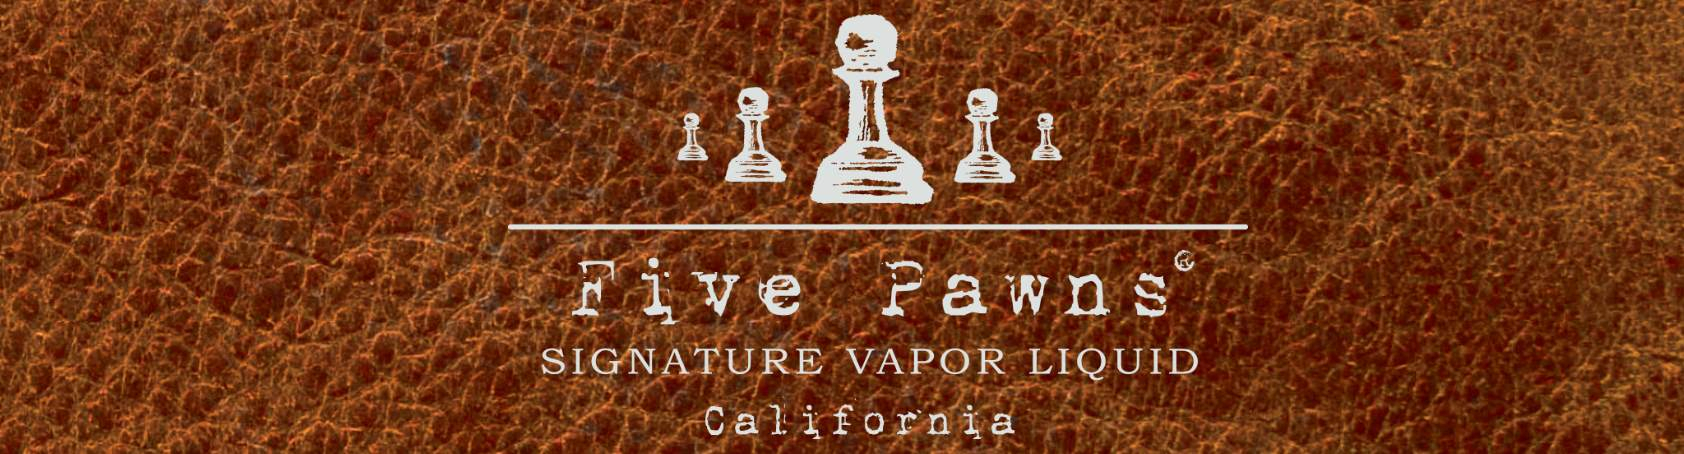 Five Pawns Liquid